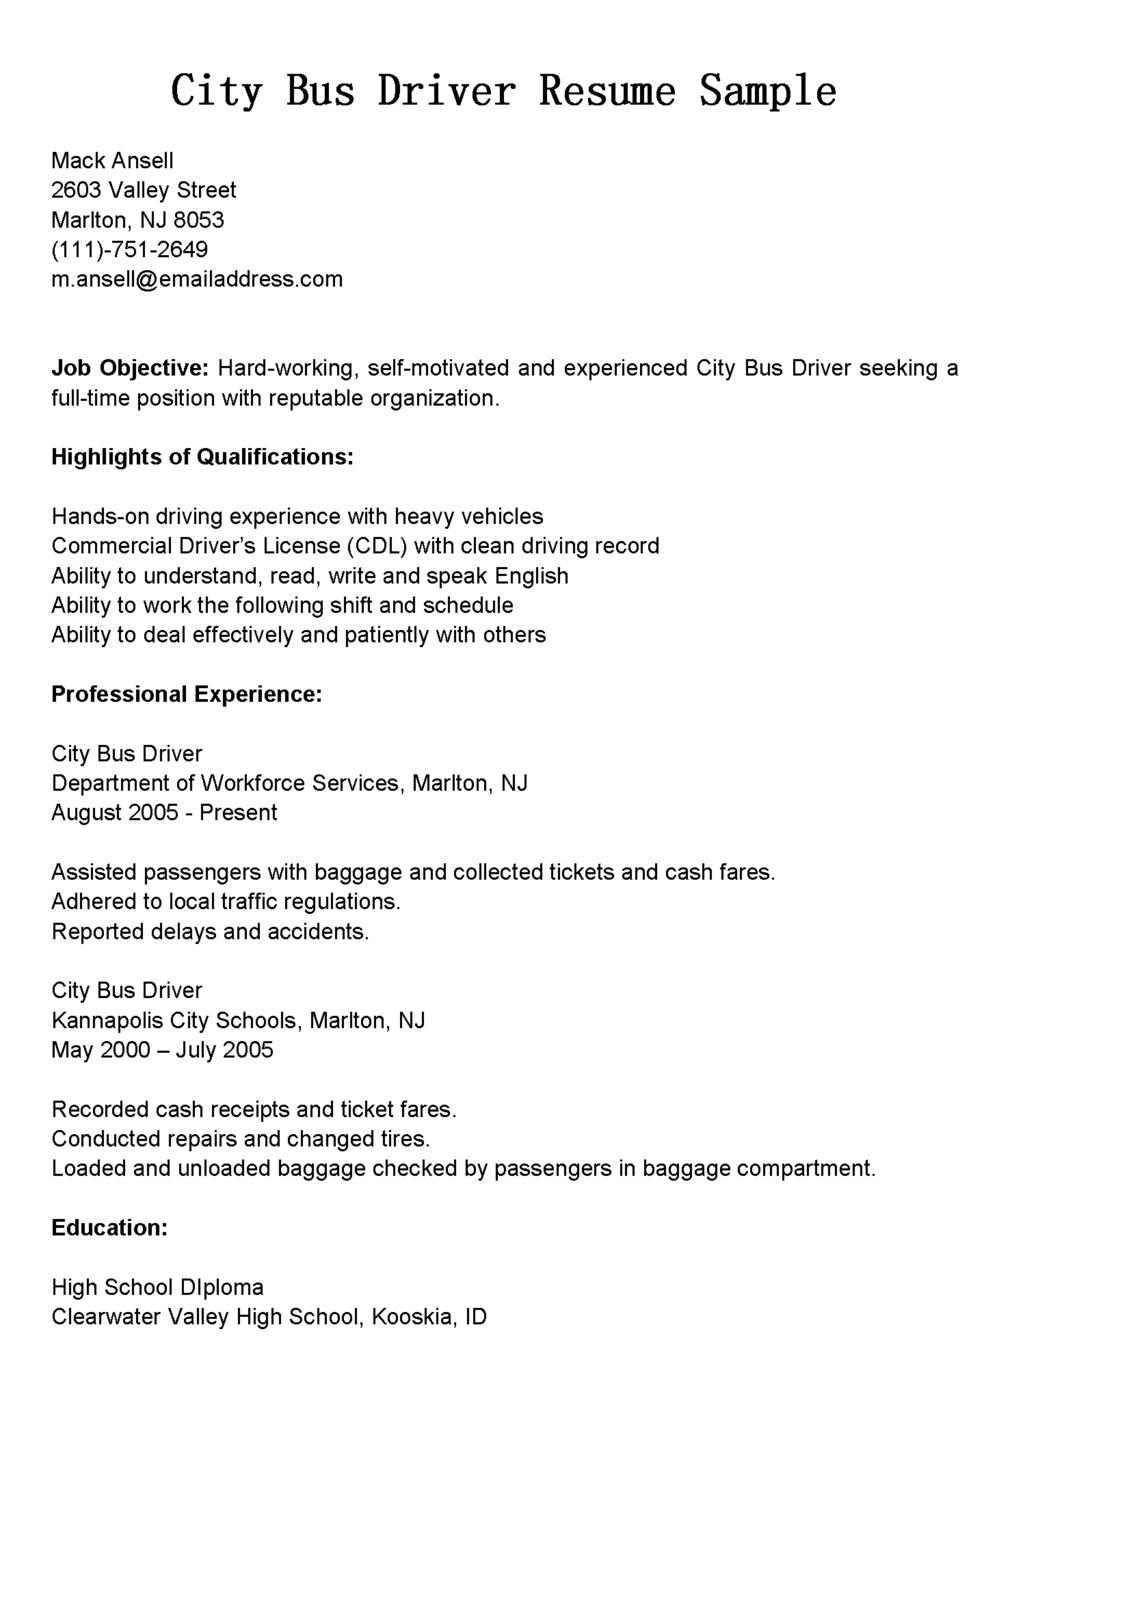 City Bus Driver Cover Letter | Amid Area Shortage Portville Central ...